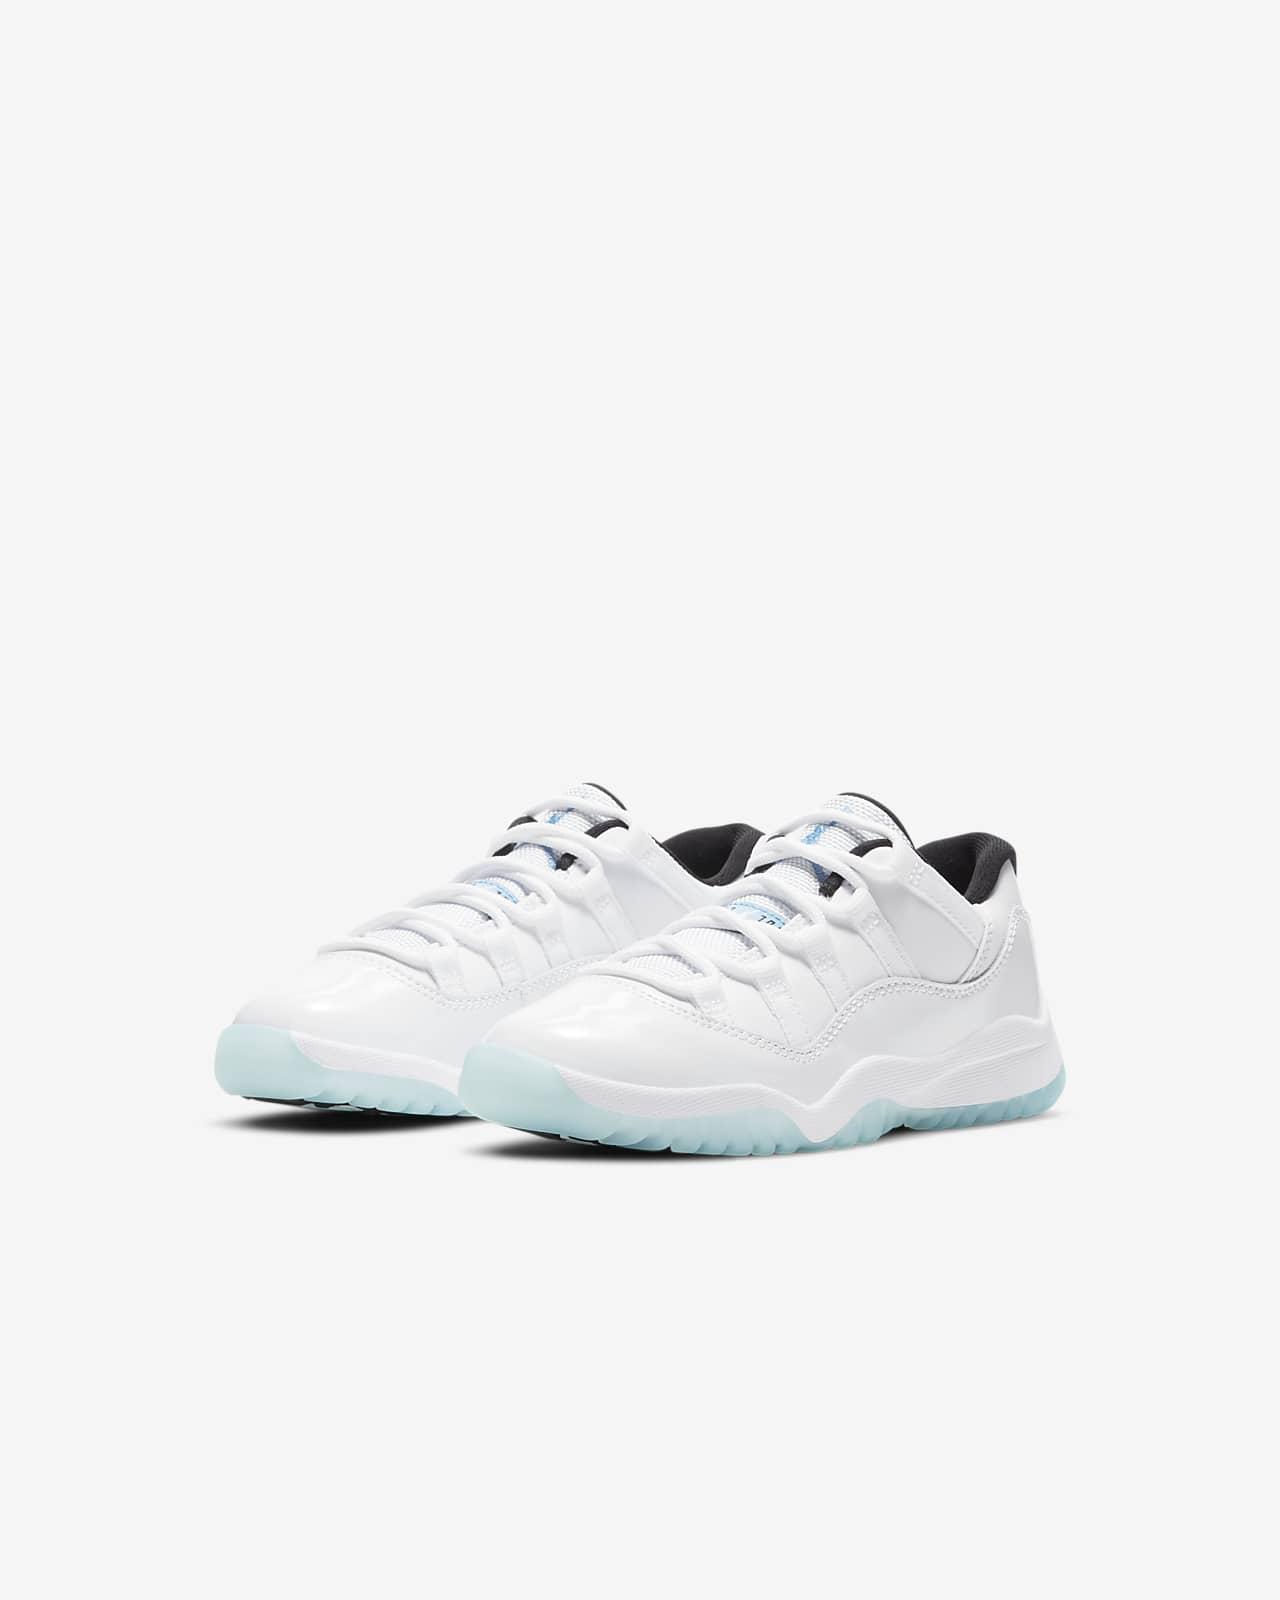 Air Jordan 11 Retro Low Younger Kids' Shoe